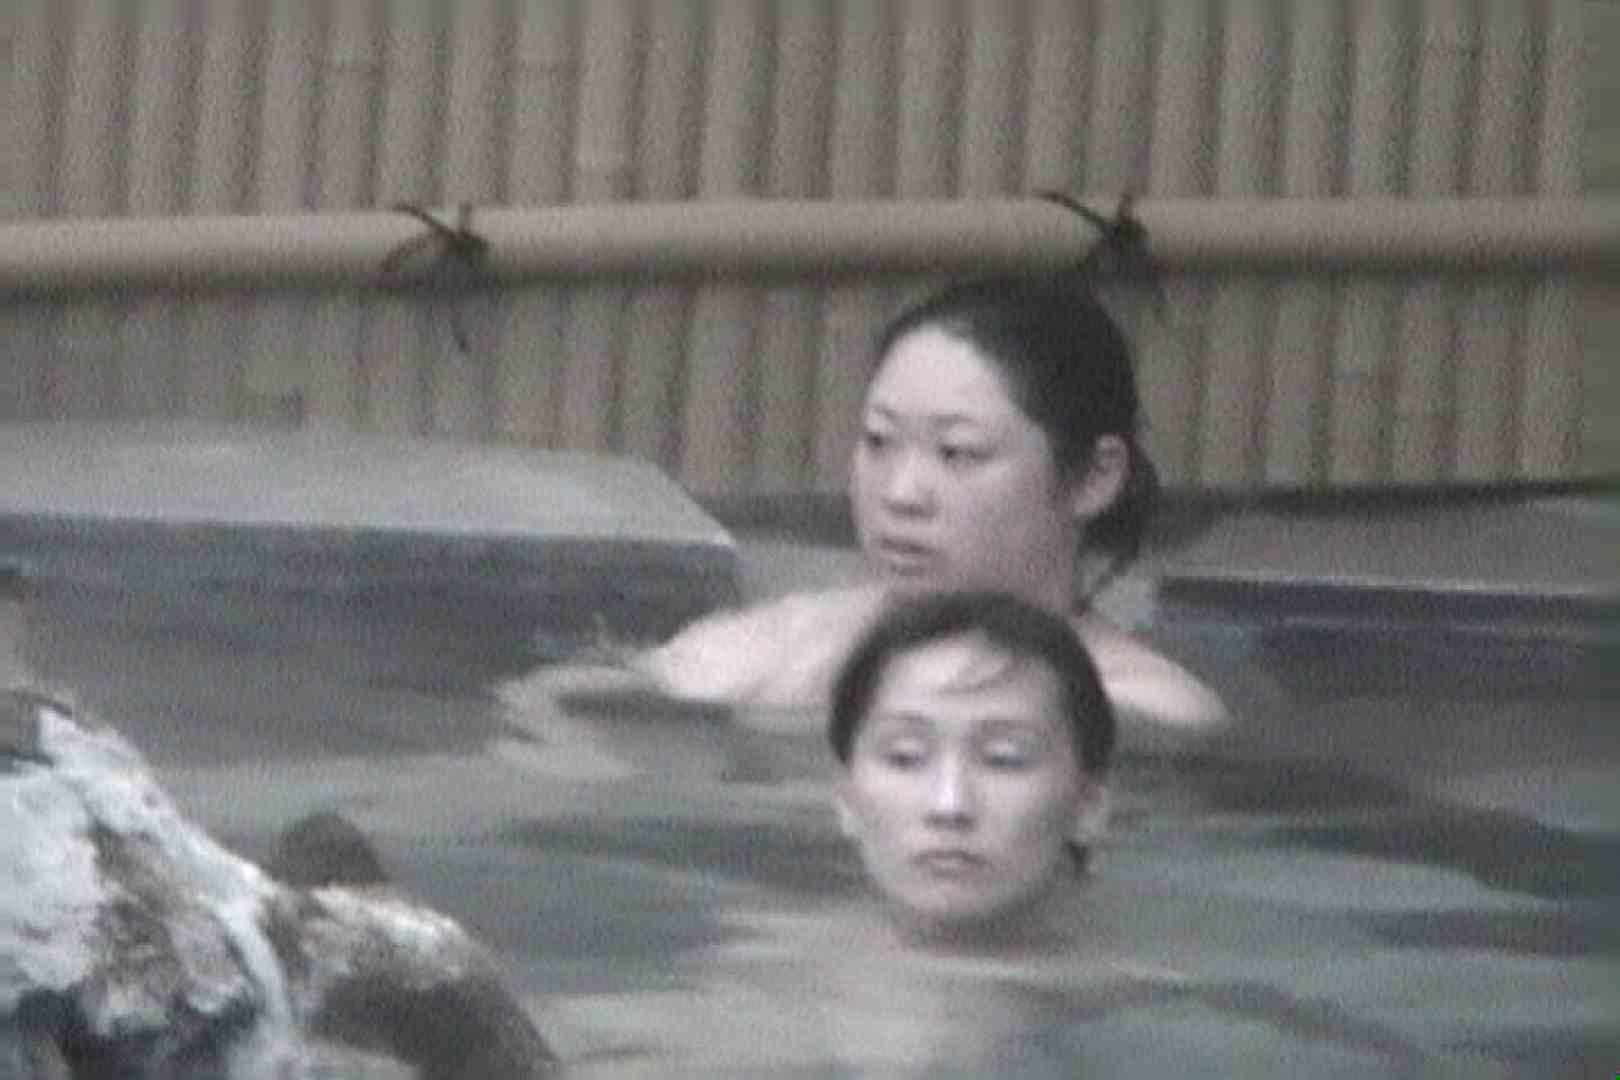 Aquaな露天風呂Vol.557 盗撮映像  23Pix 9